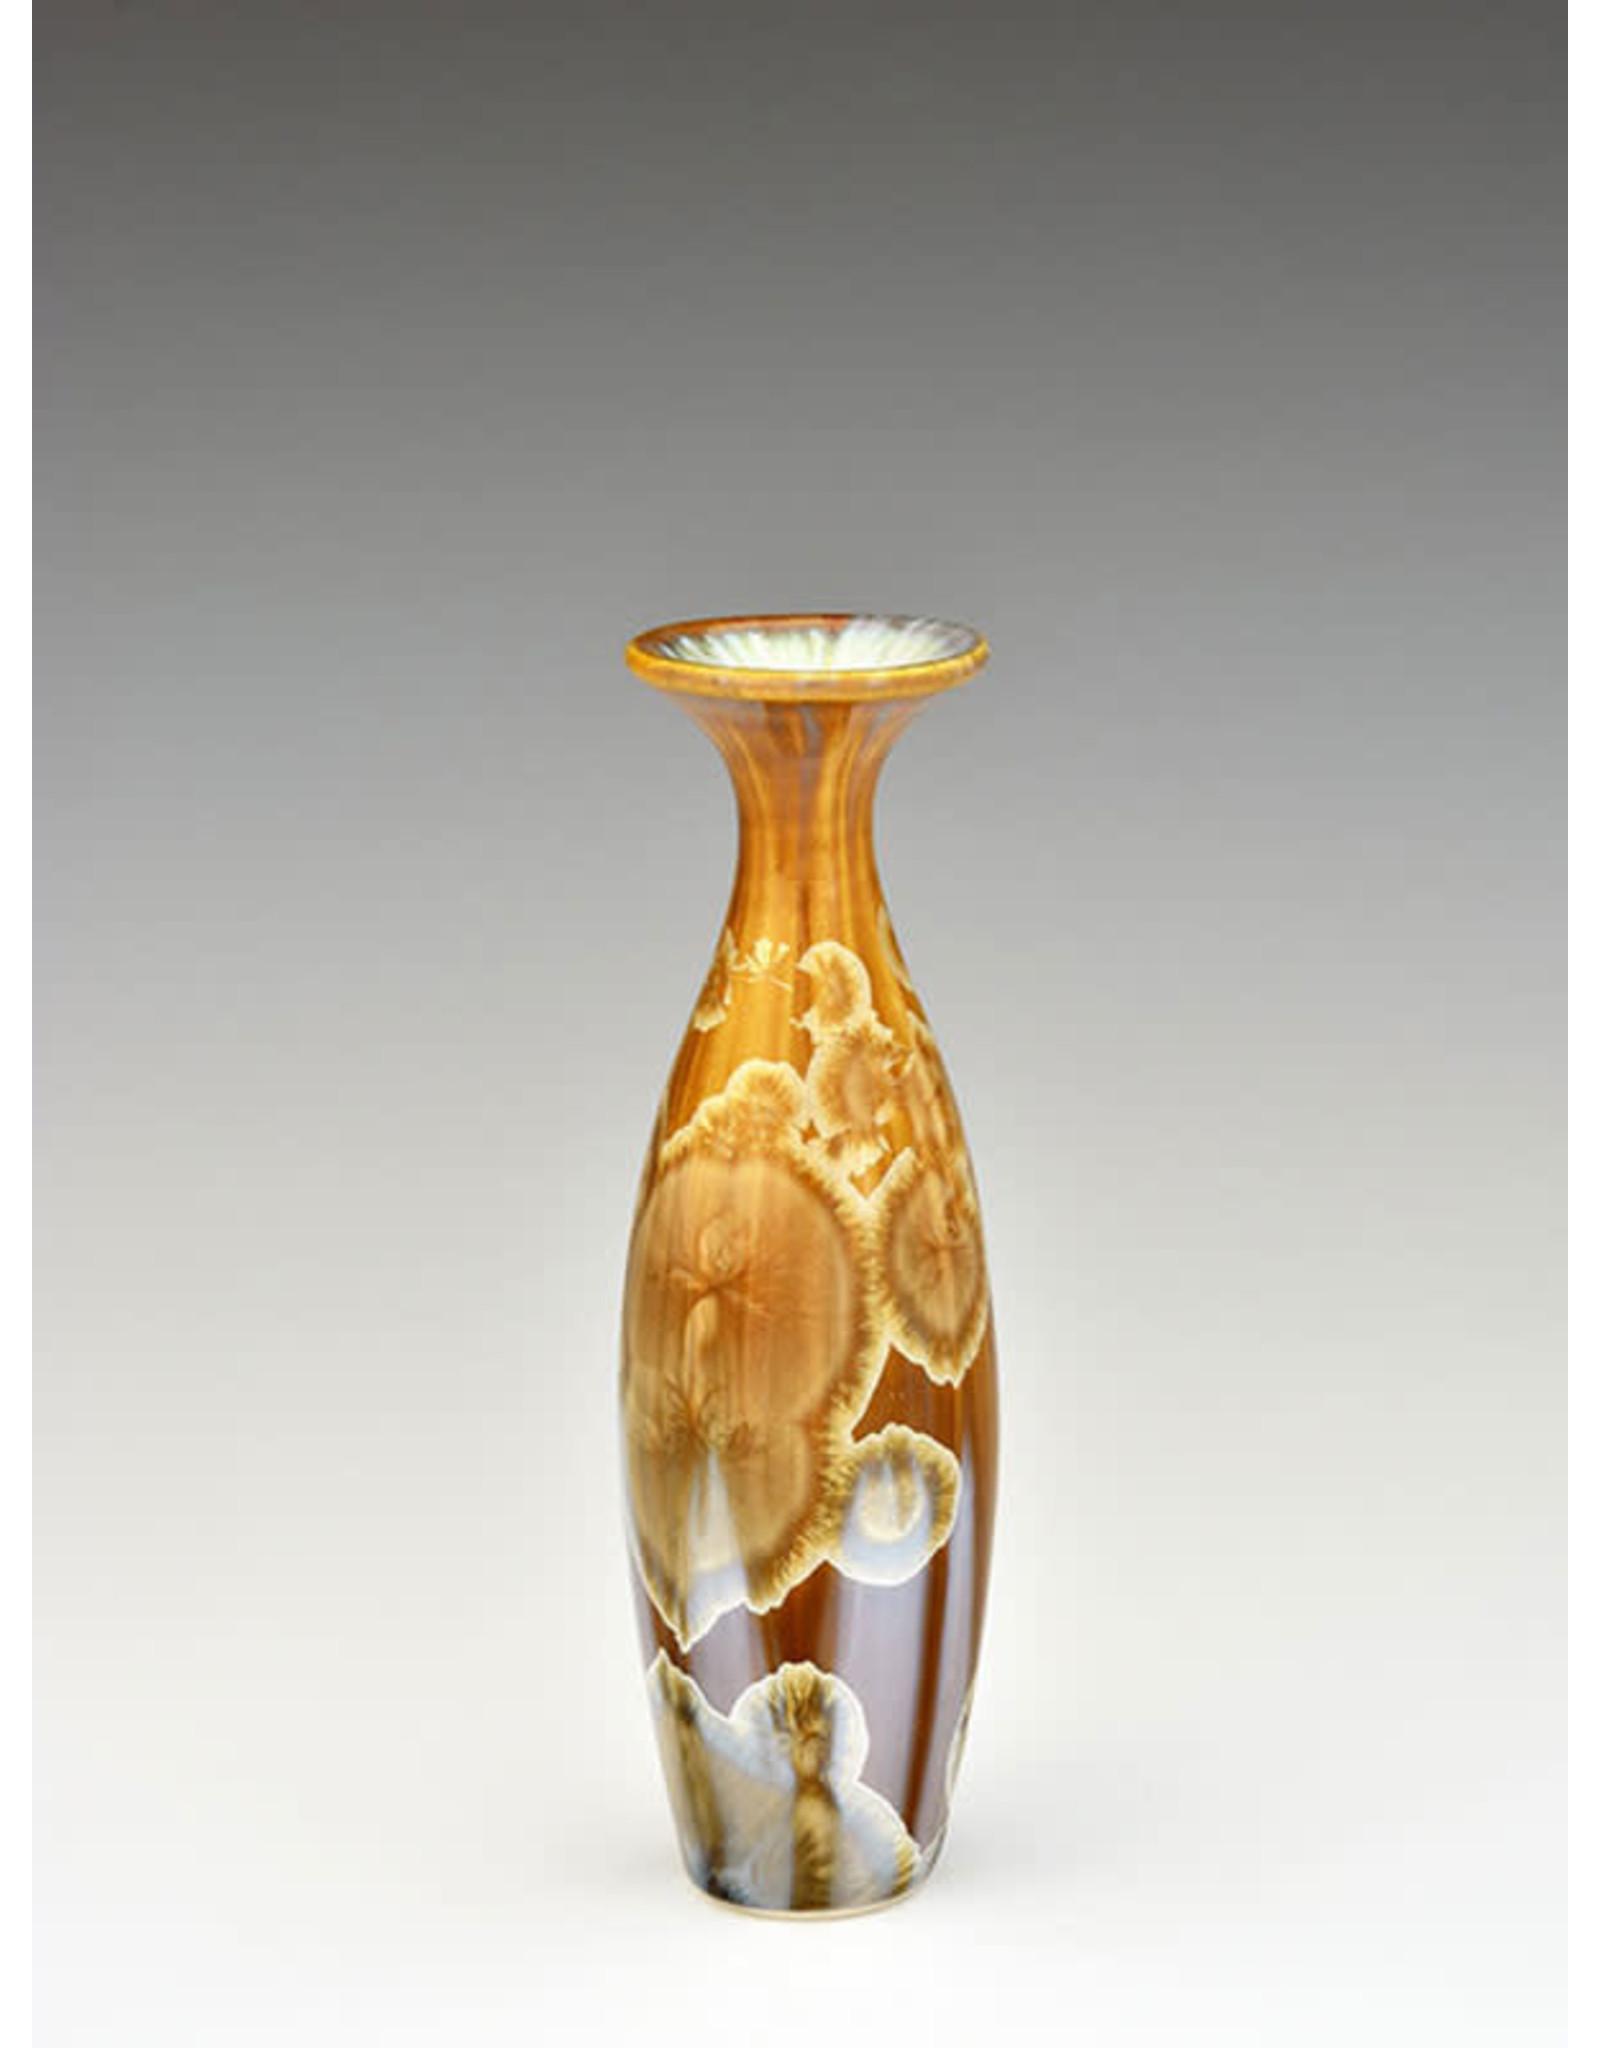 Stellar Art Pottery Stellar Art Pottery Bud Vase